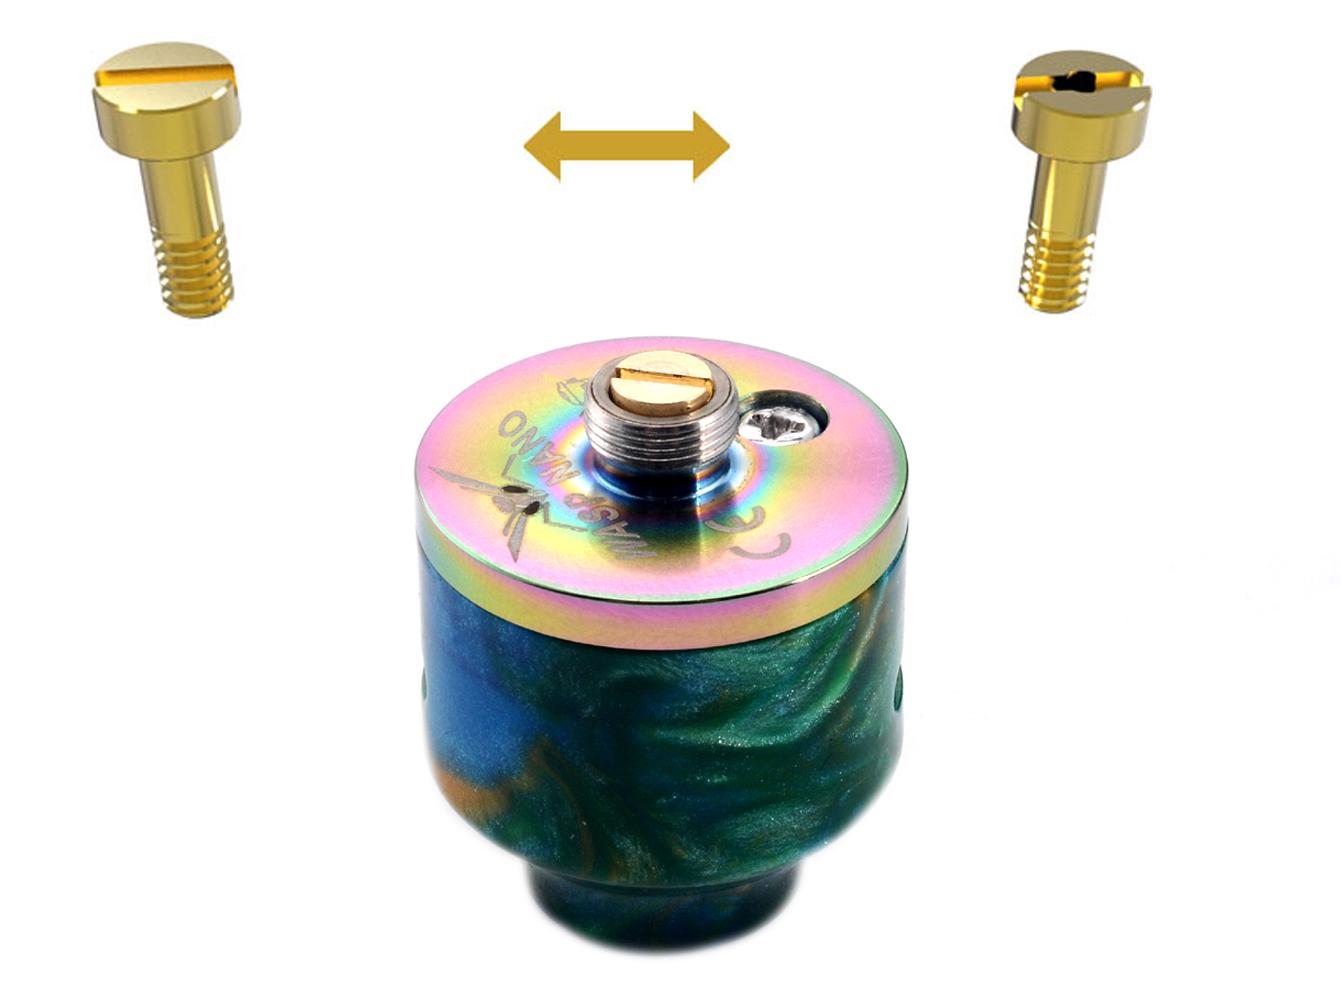 Oumier Wasp Nano RDA Rebuildable Drip Atomizer Resin Bottom Pin